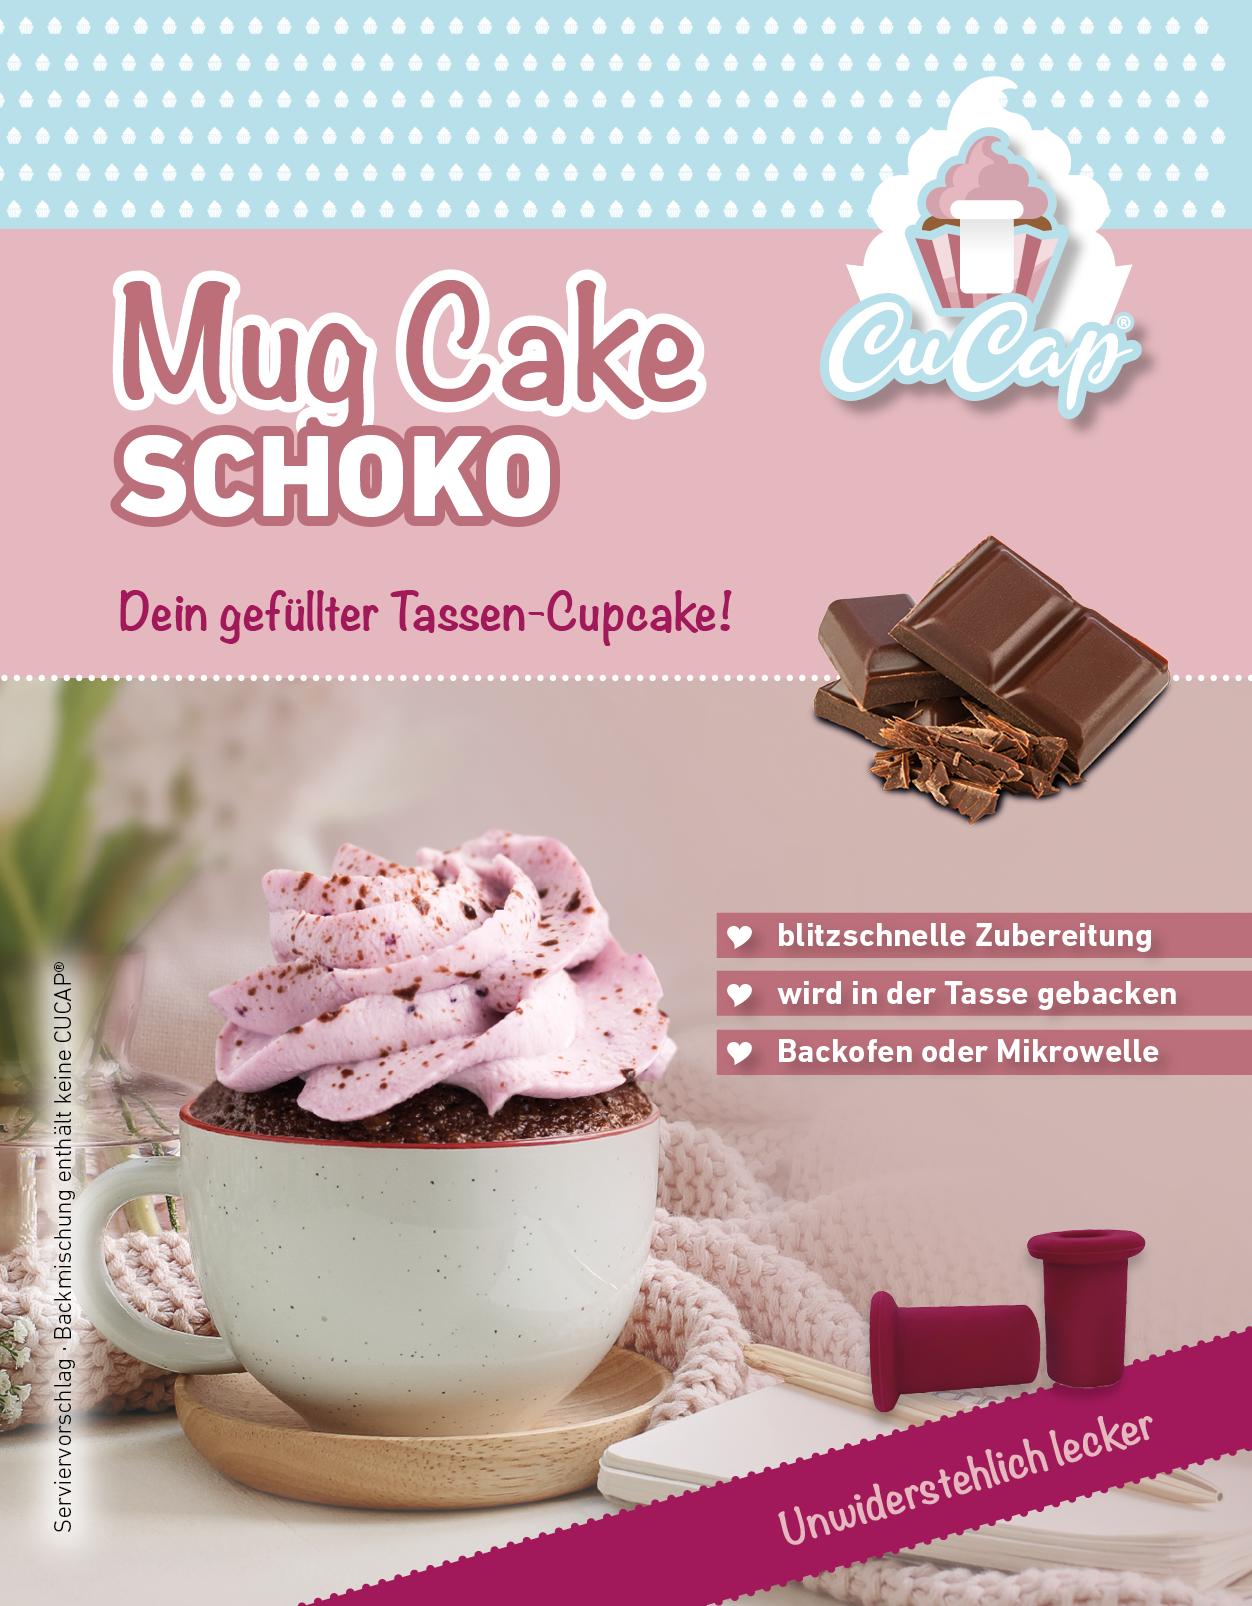 MugCake (Tassen-Cupcake) Schoko